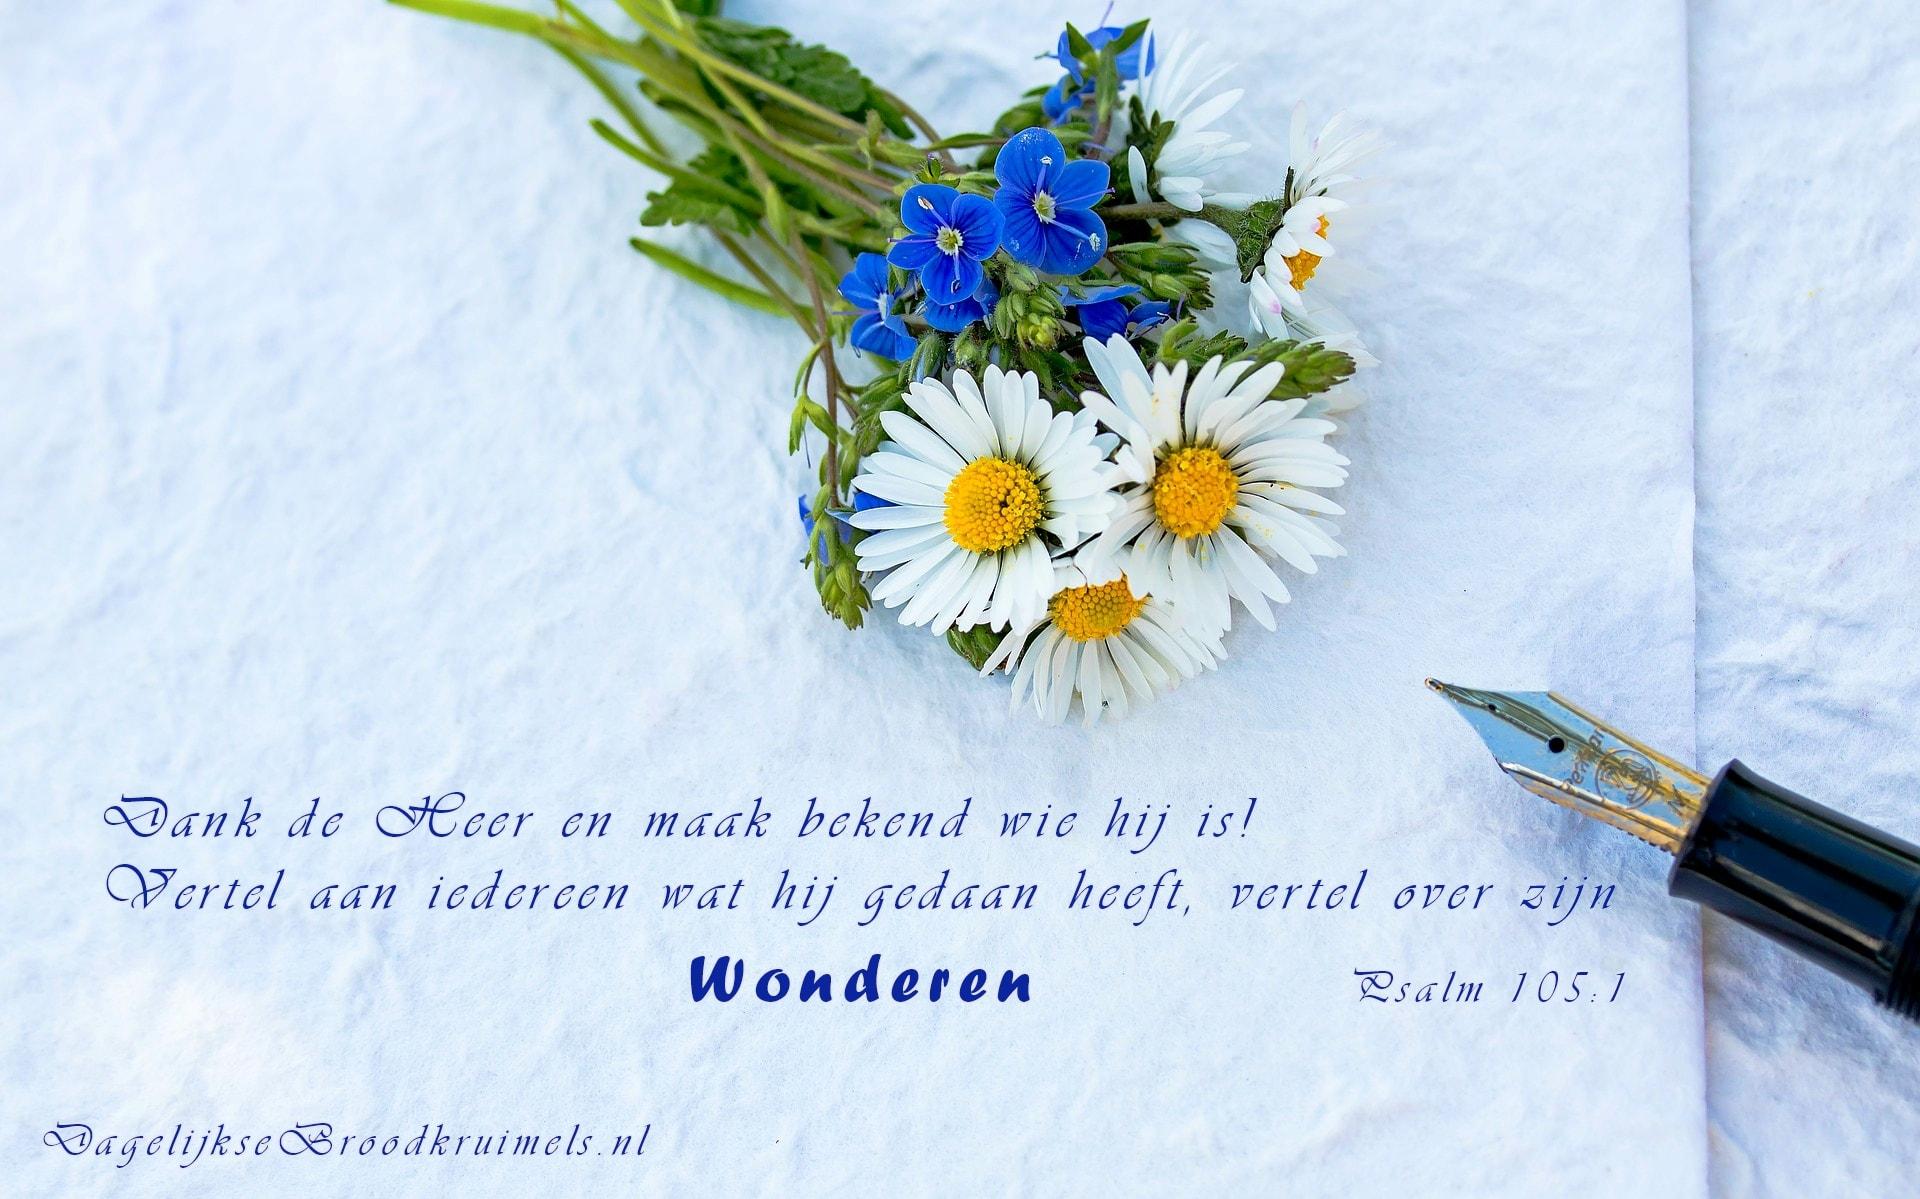 Psalm 105 vers 1